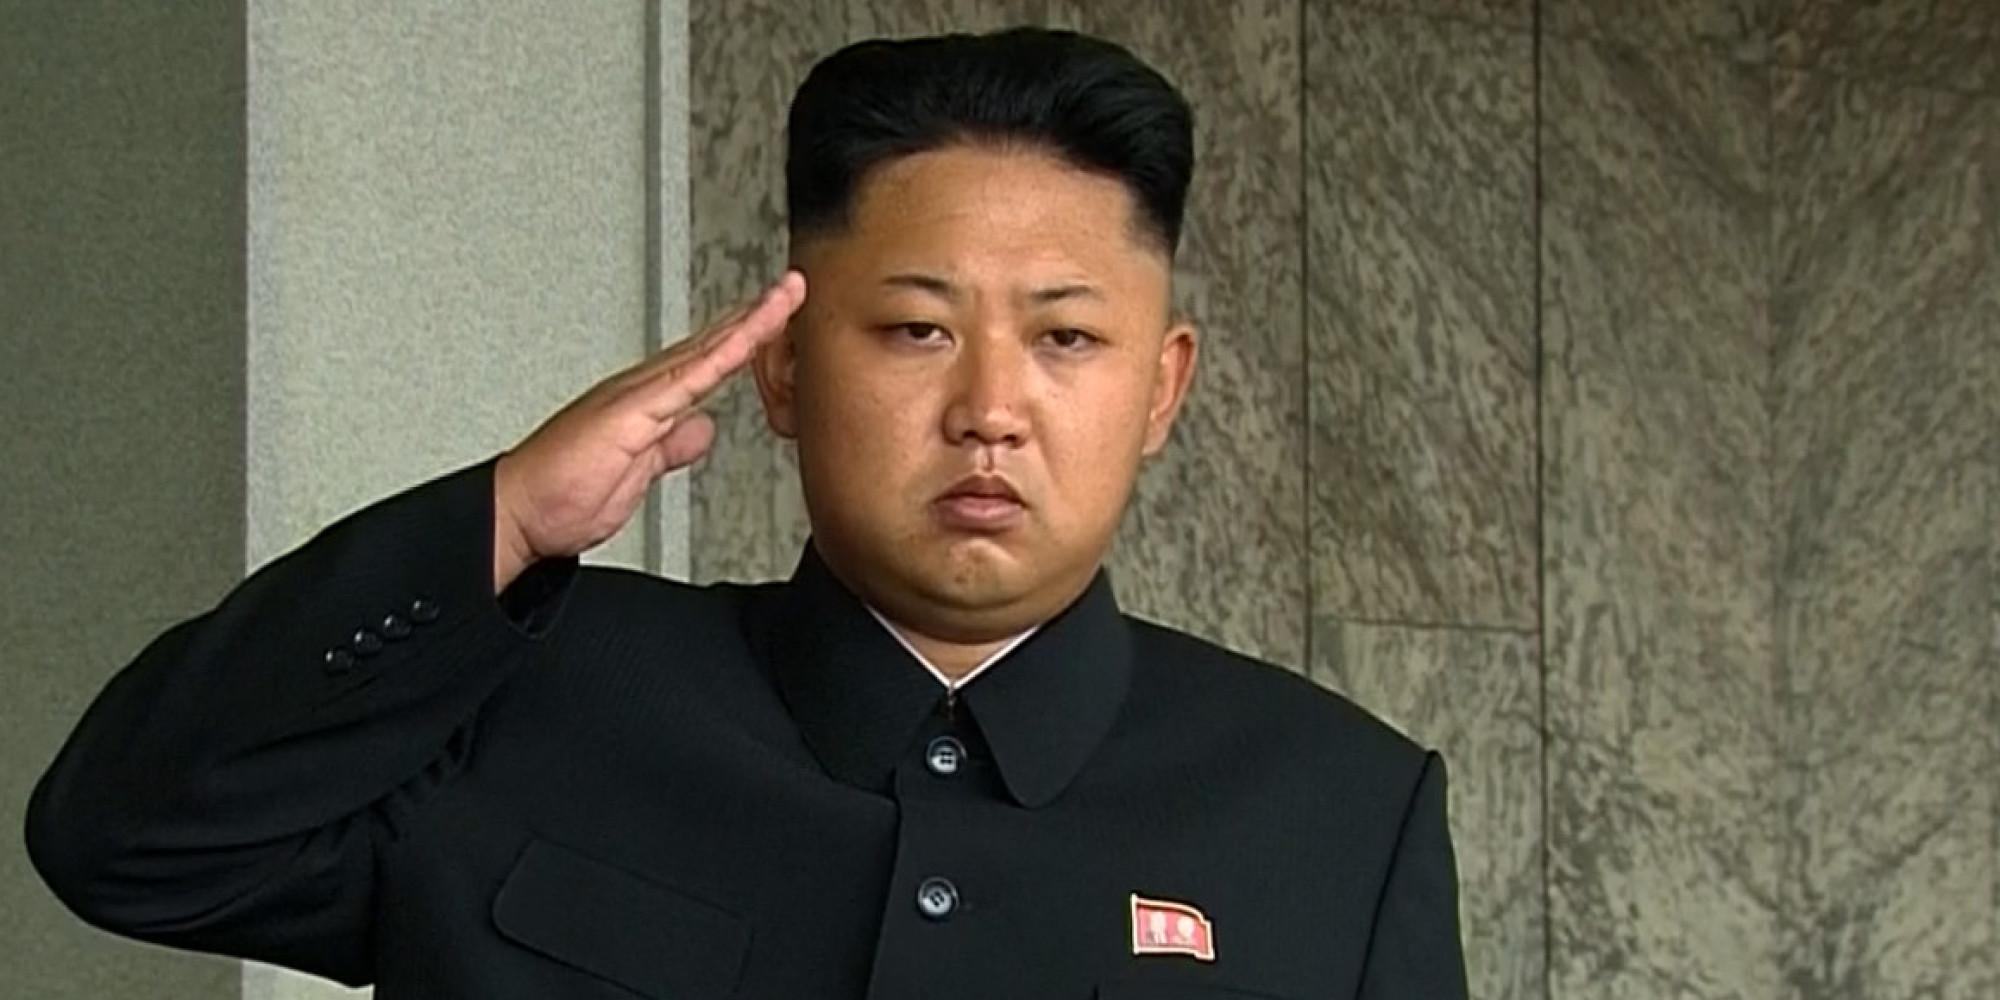 President Kim Jong-un - age: 34